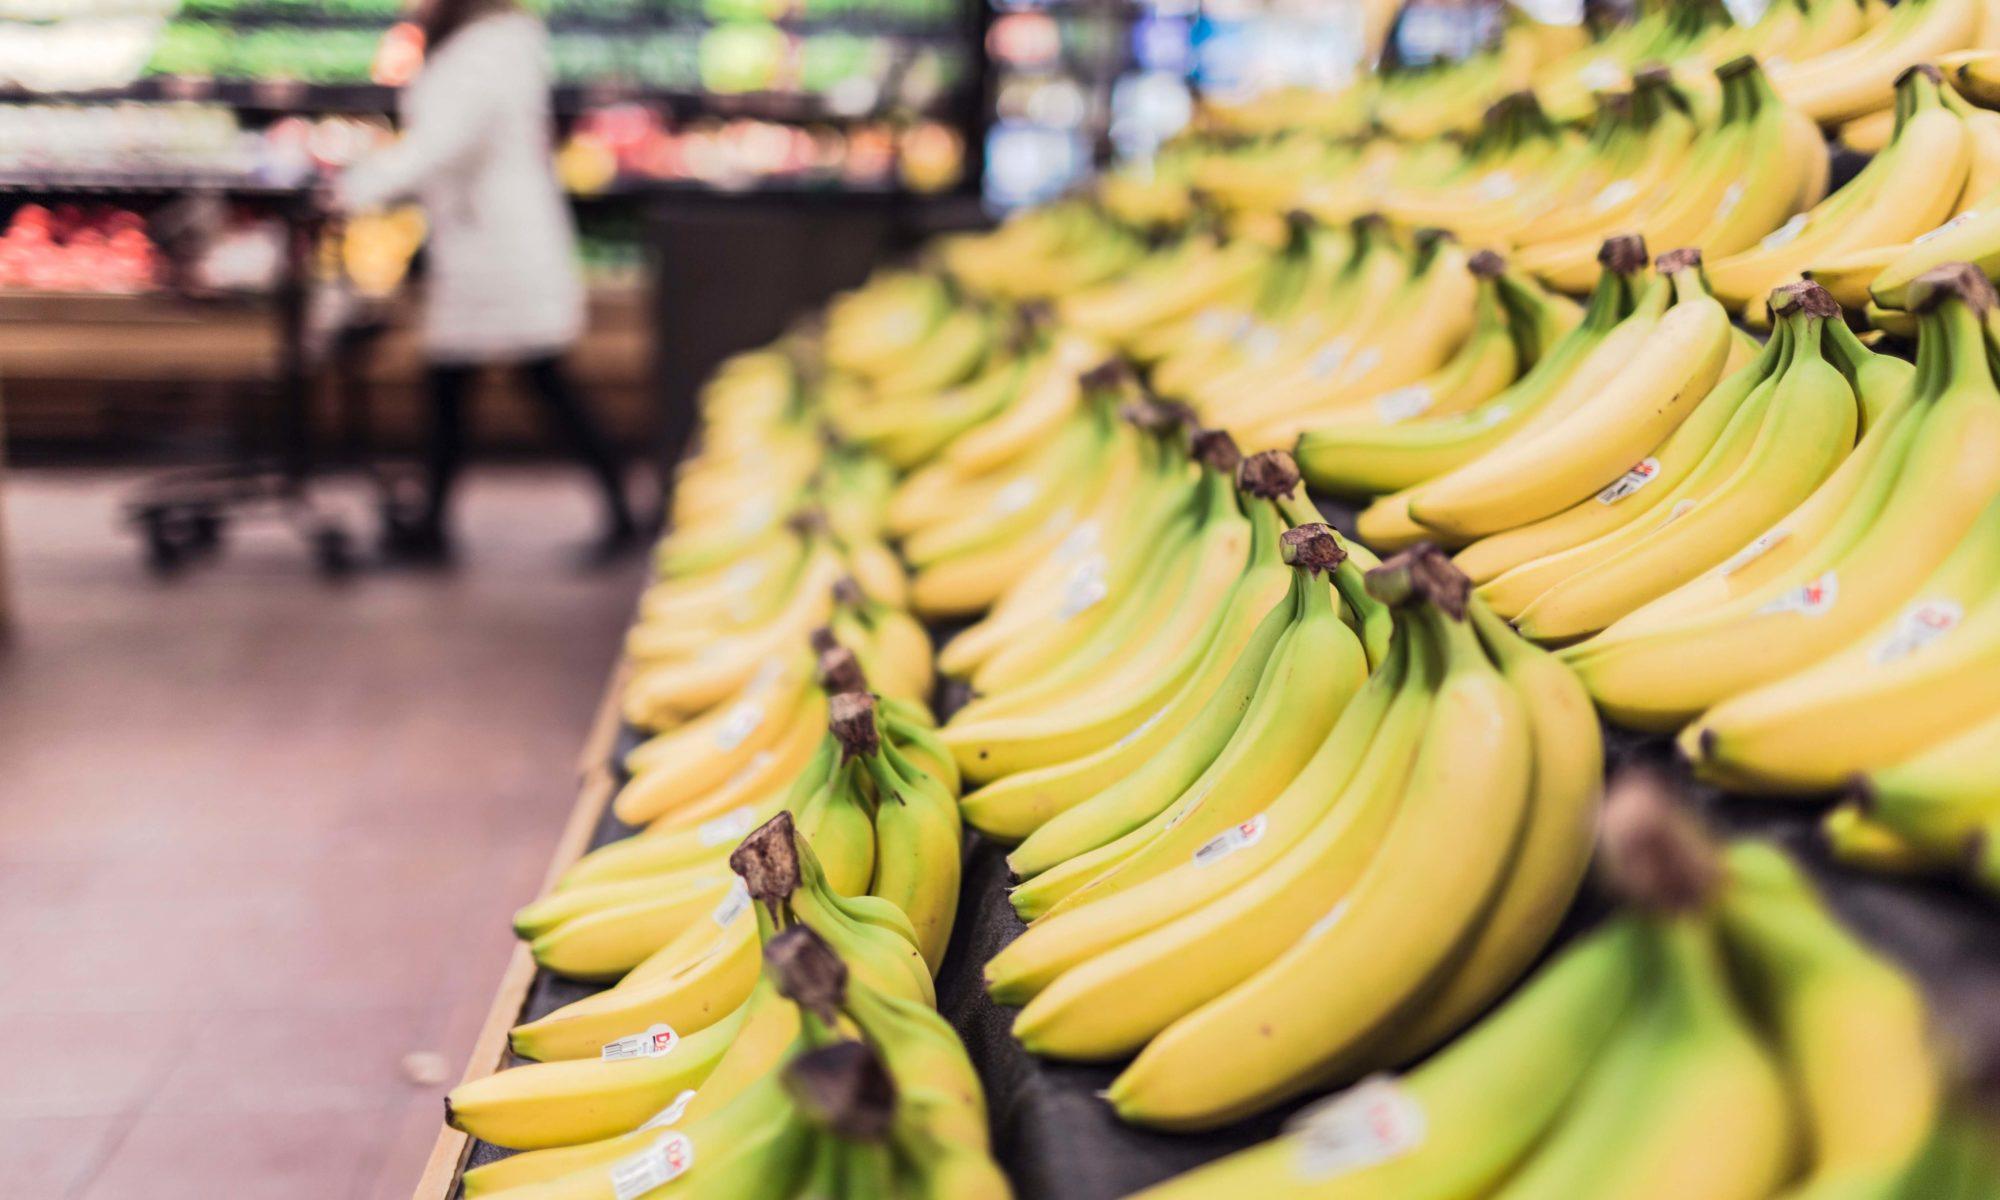 Veganes im Supermarkt in Portugal